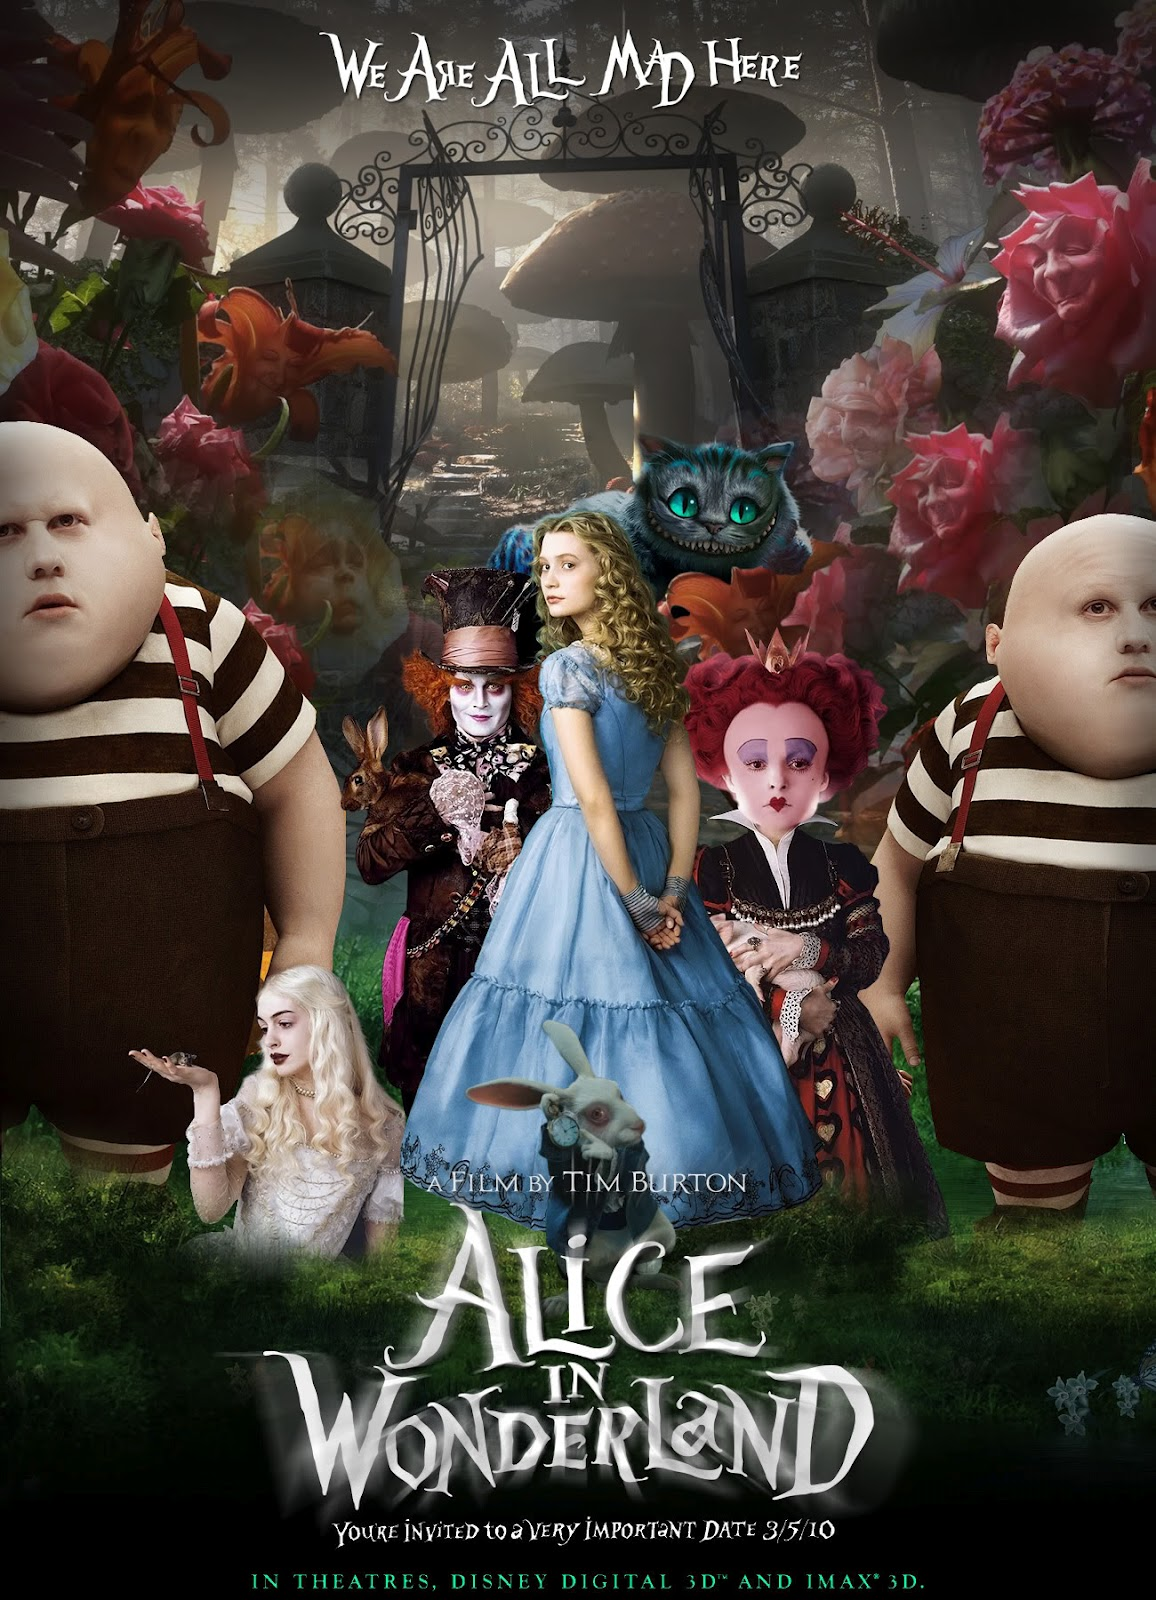 http://2.bp.blogspot.com/-lv6p7nP-aOA/UBijDETuD4I/AAAAAAAAJnc/i1wbJgo5vbY/s1600/Alice_in_wonderland_poster_2_1_original1.jpg